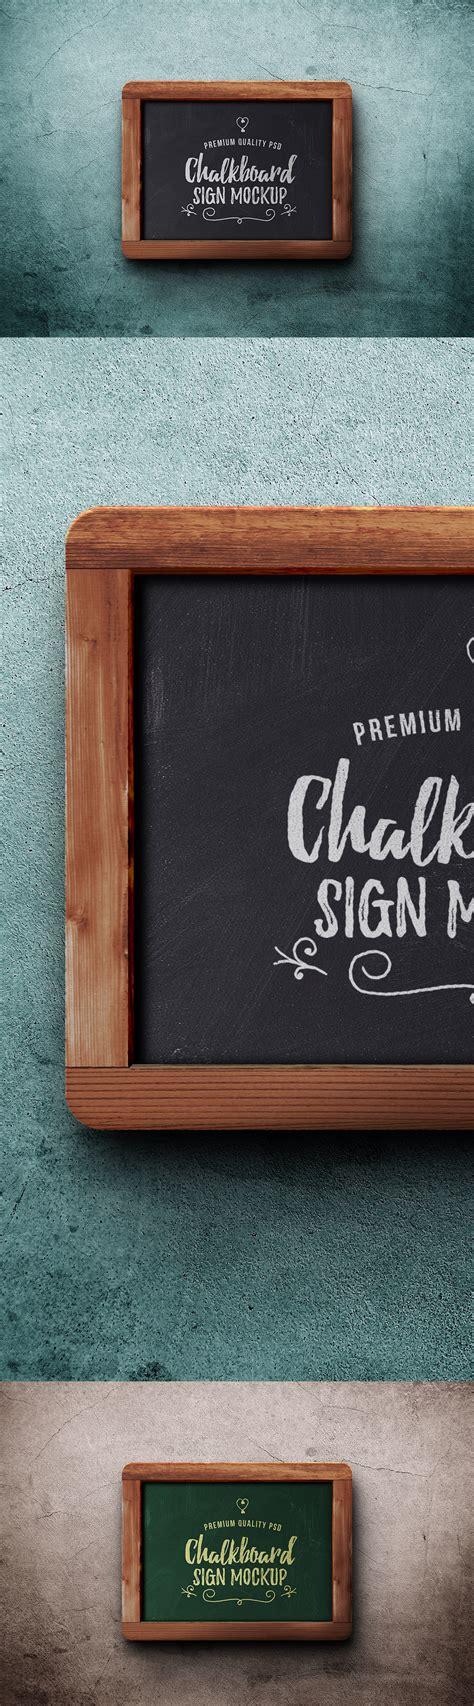 chalkboard sign psd mockup cloverdesain